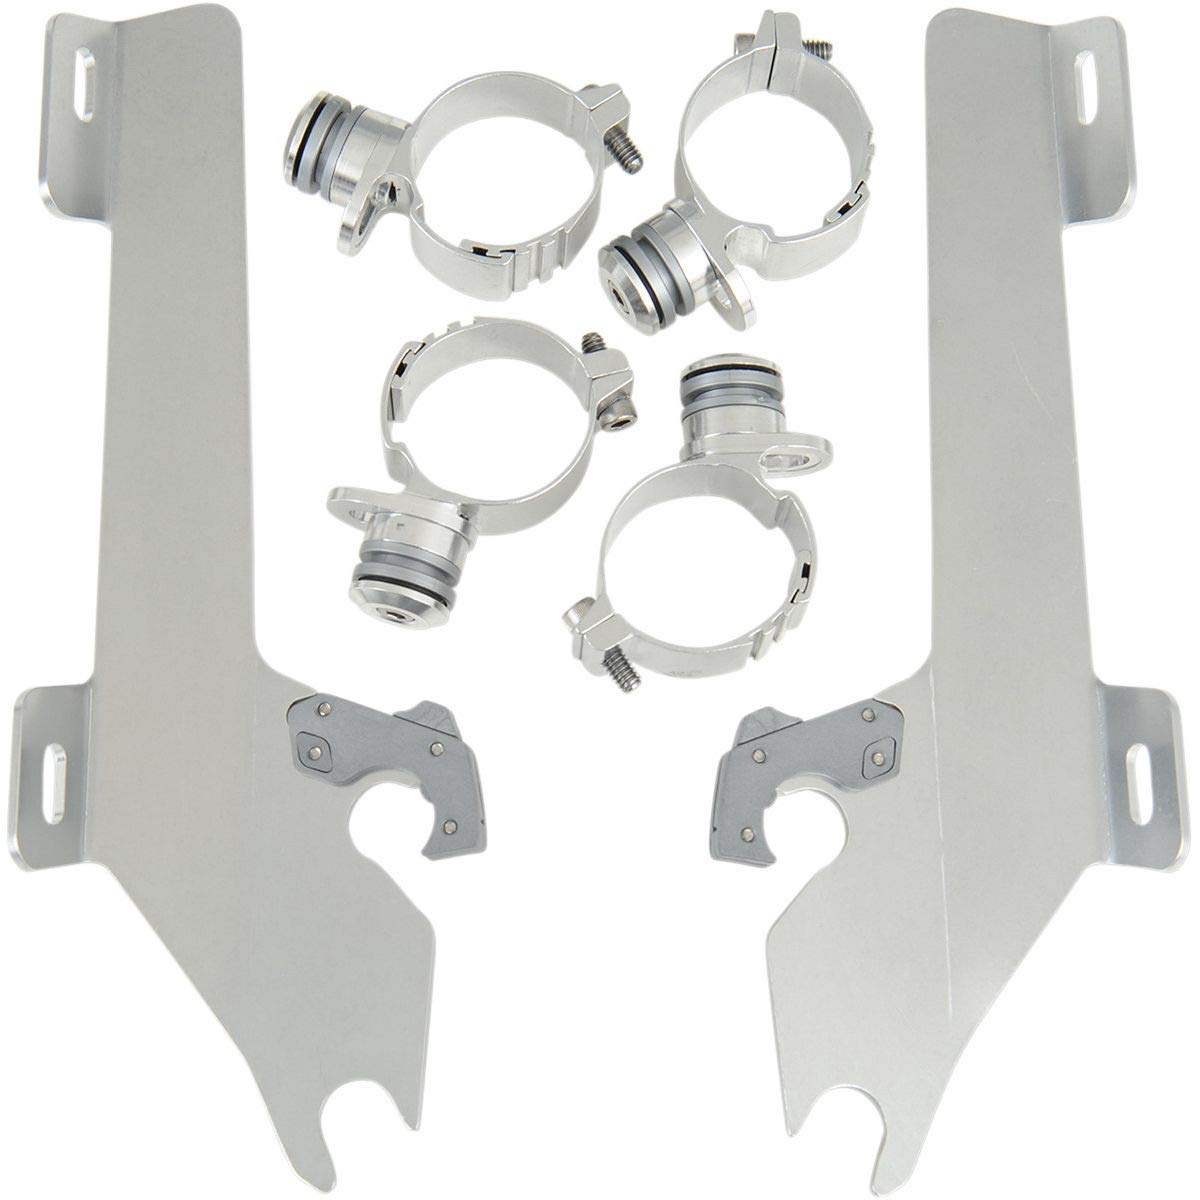 Pro Braking PBR4316-GLD-BLA Rear Braided Brake Line